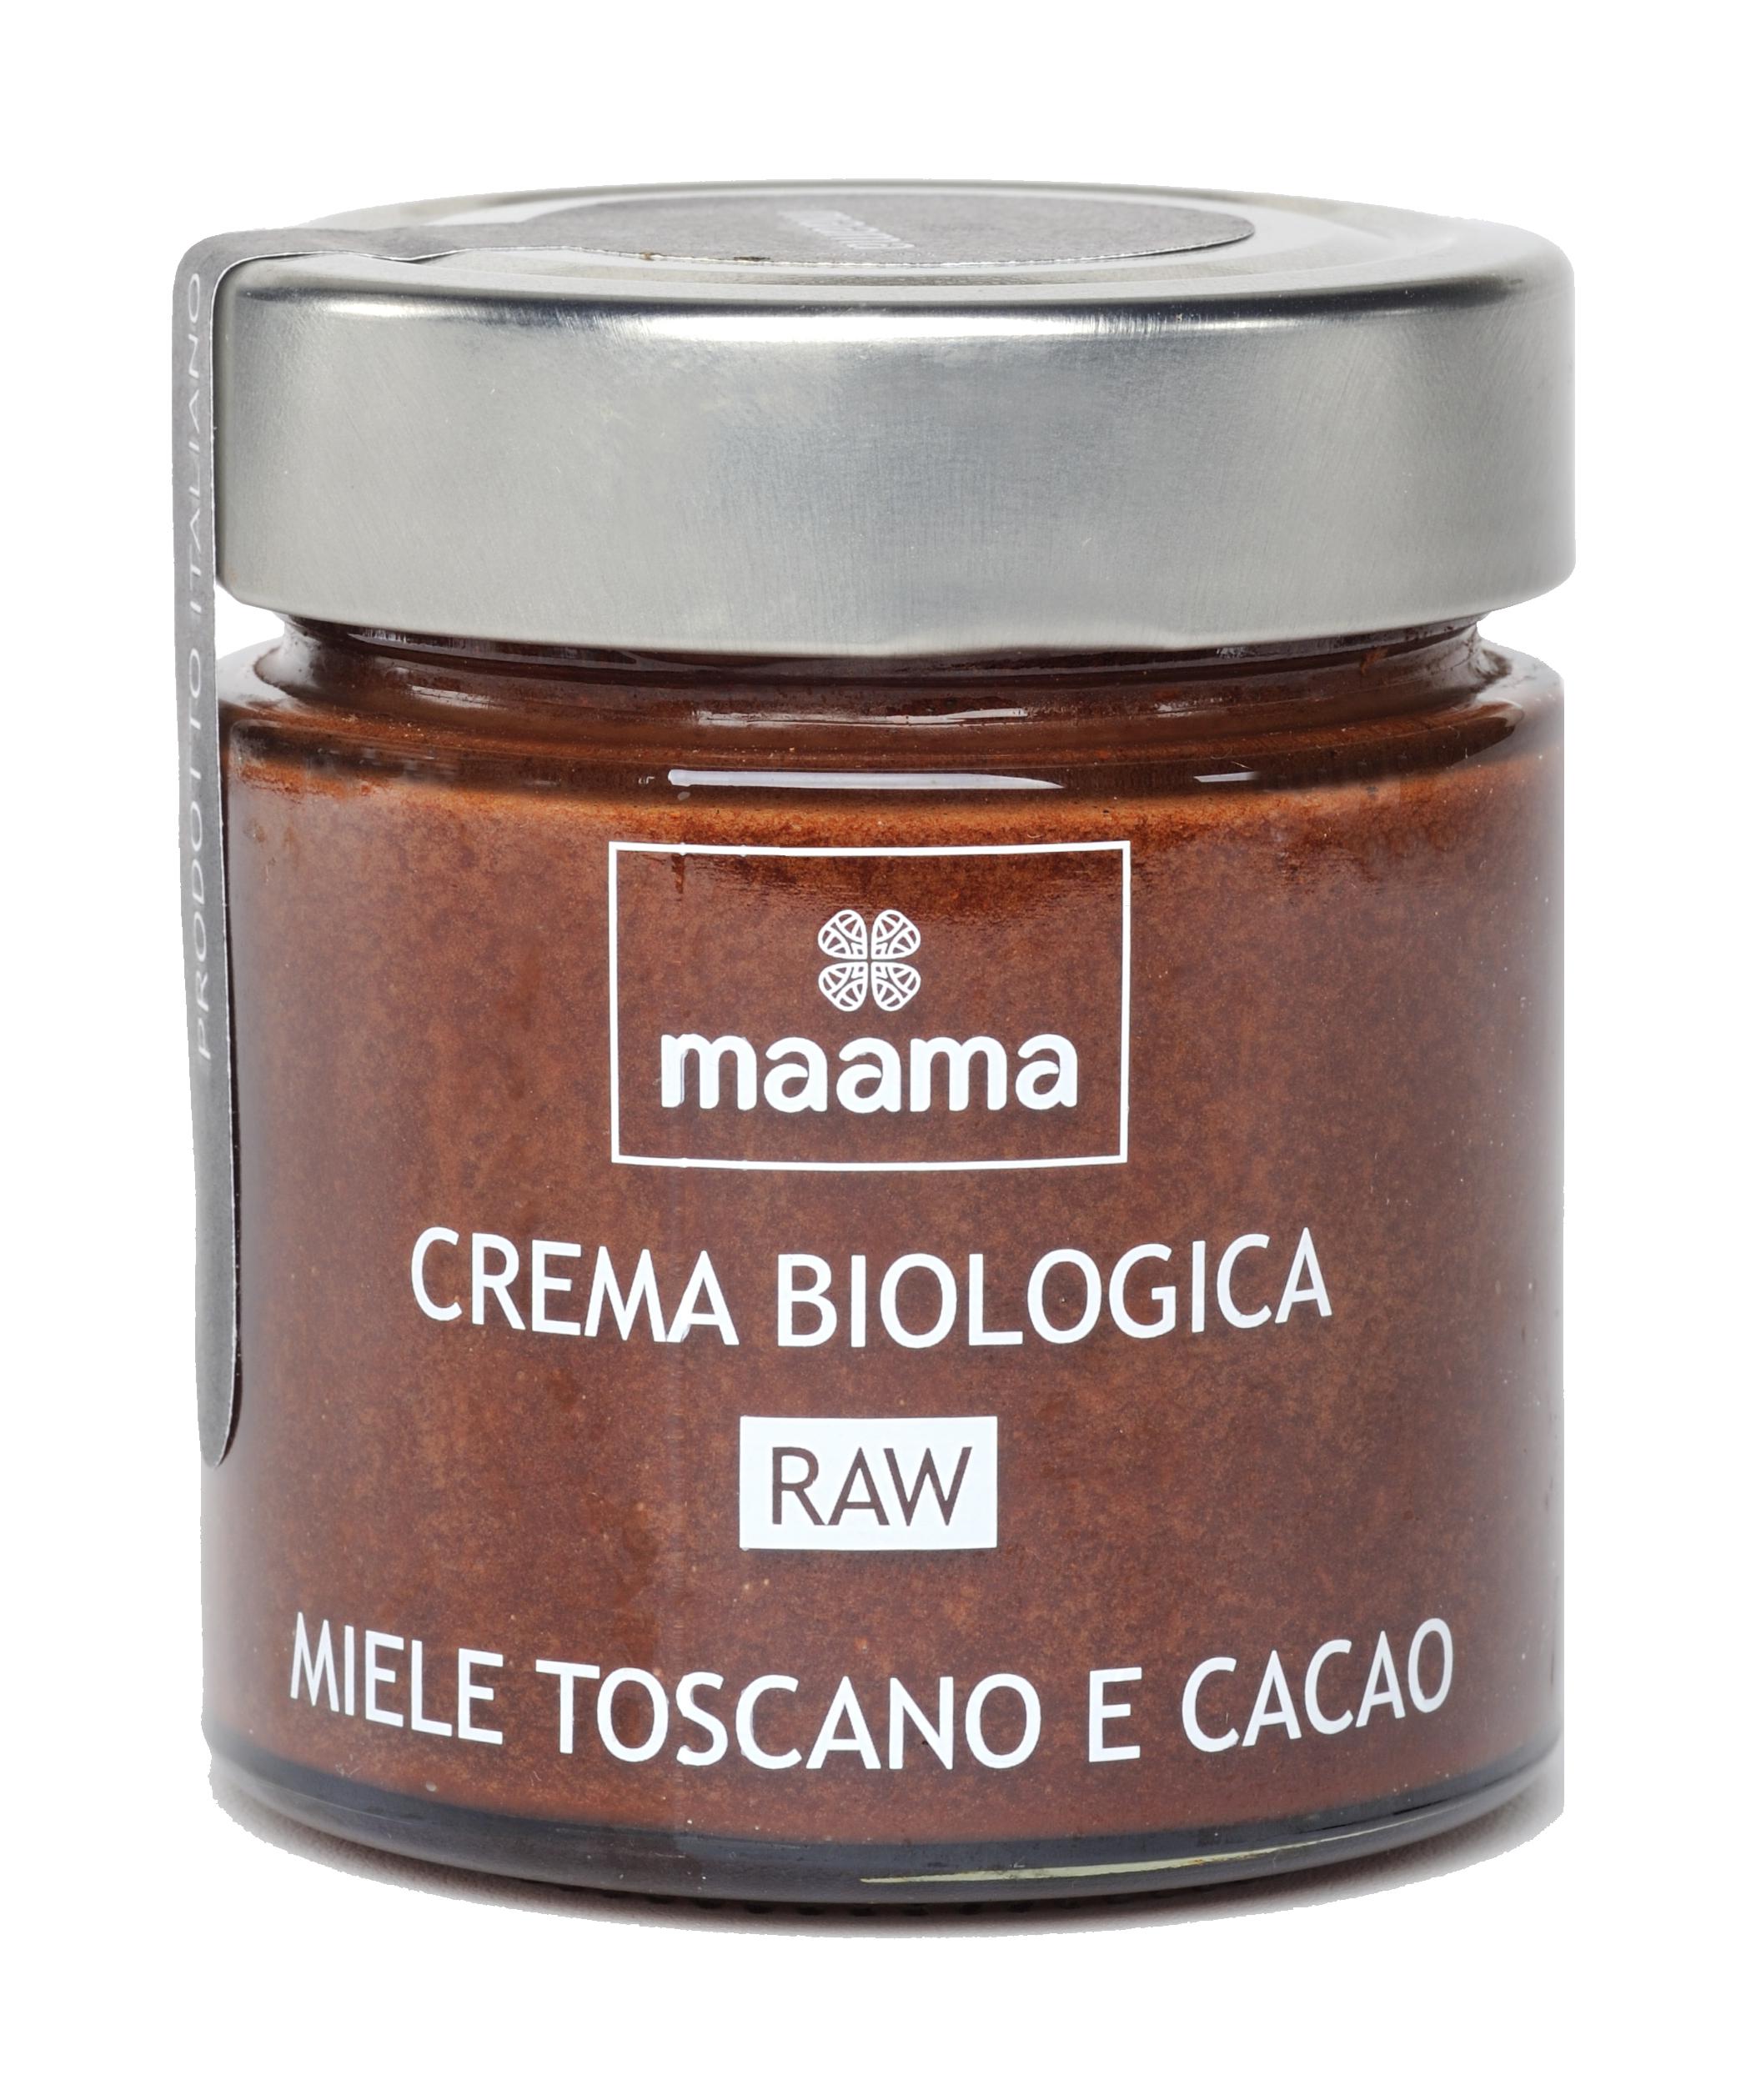 Crema biologica miele e cacao